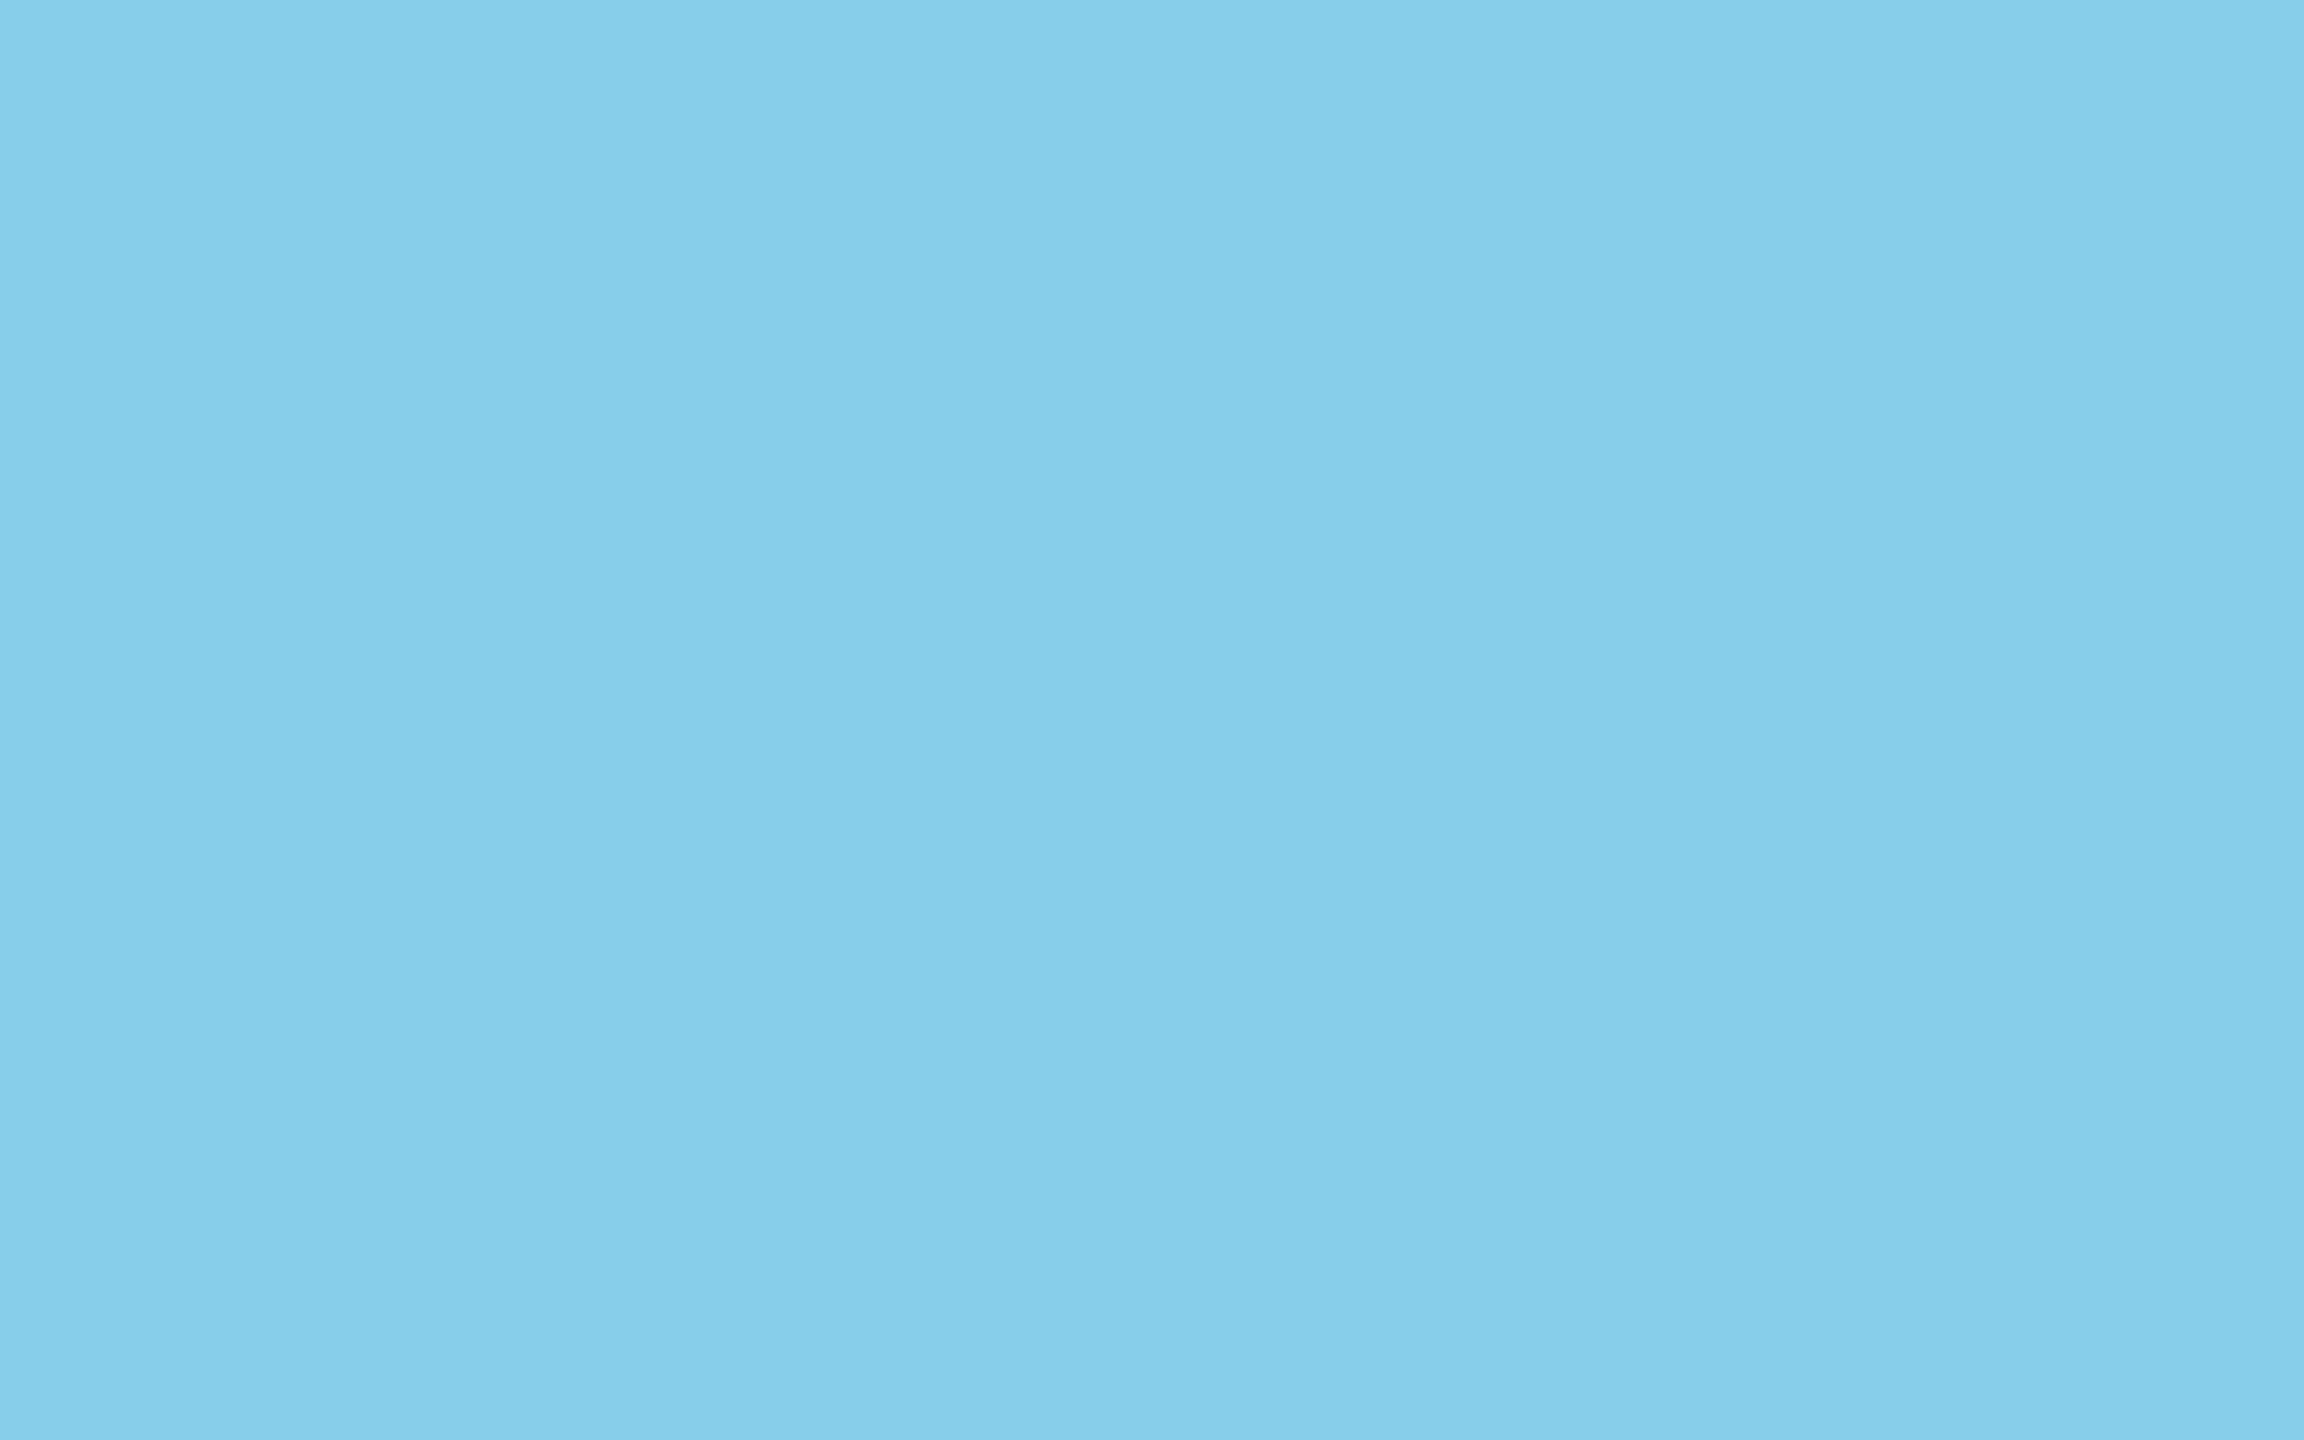 2304x1440 Sky Blue Solid Color Background